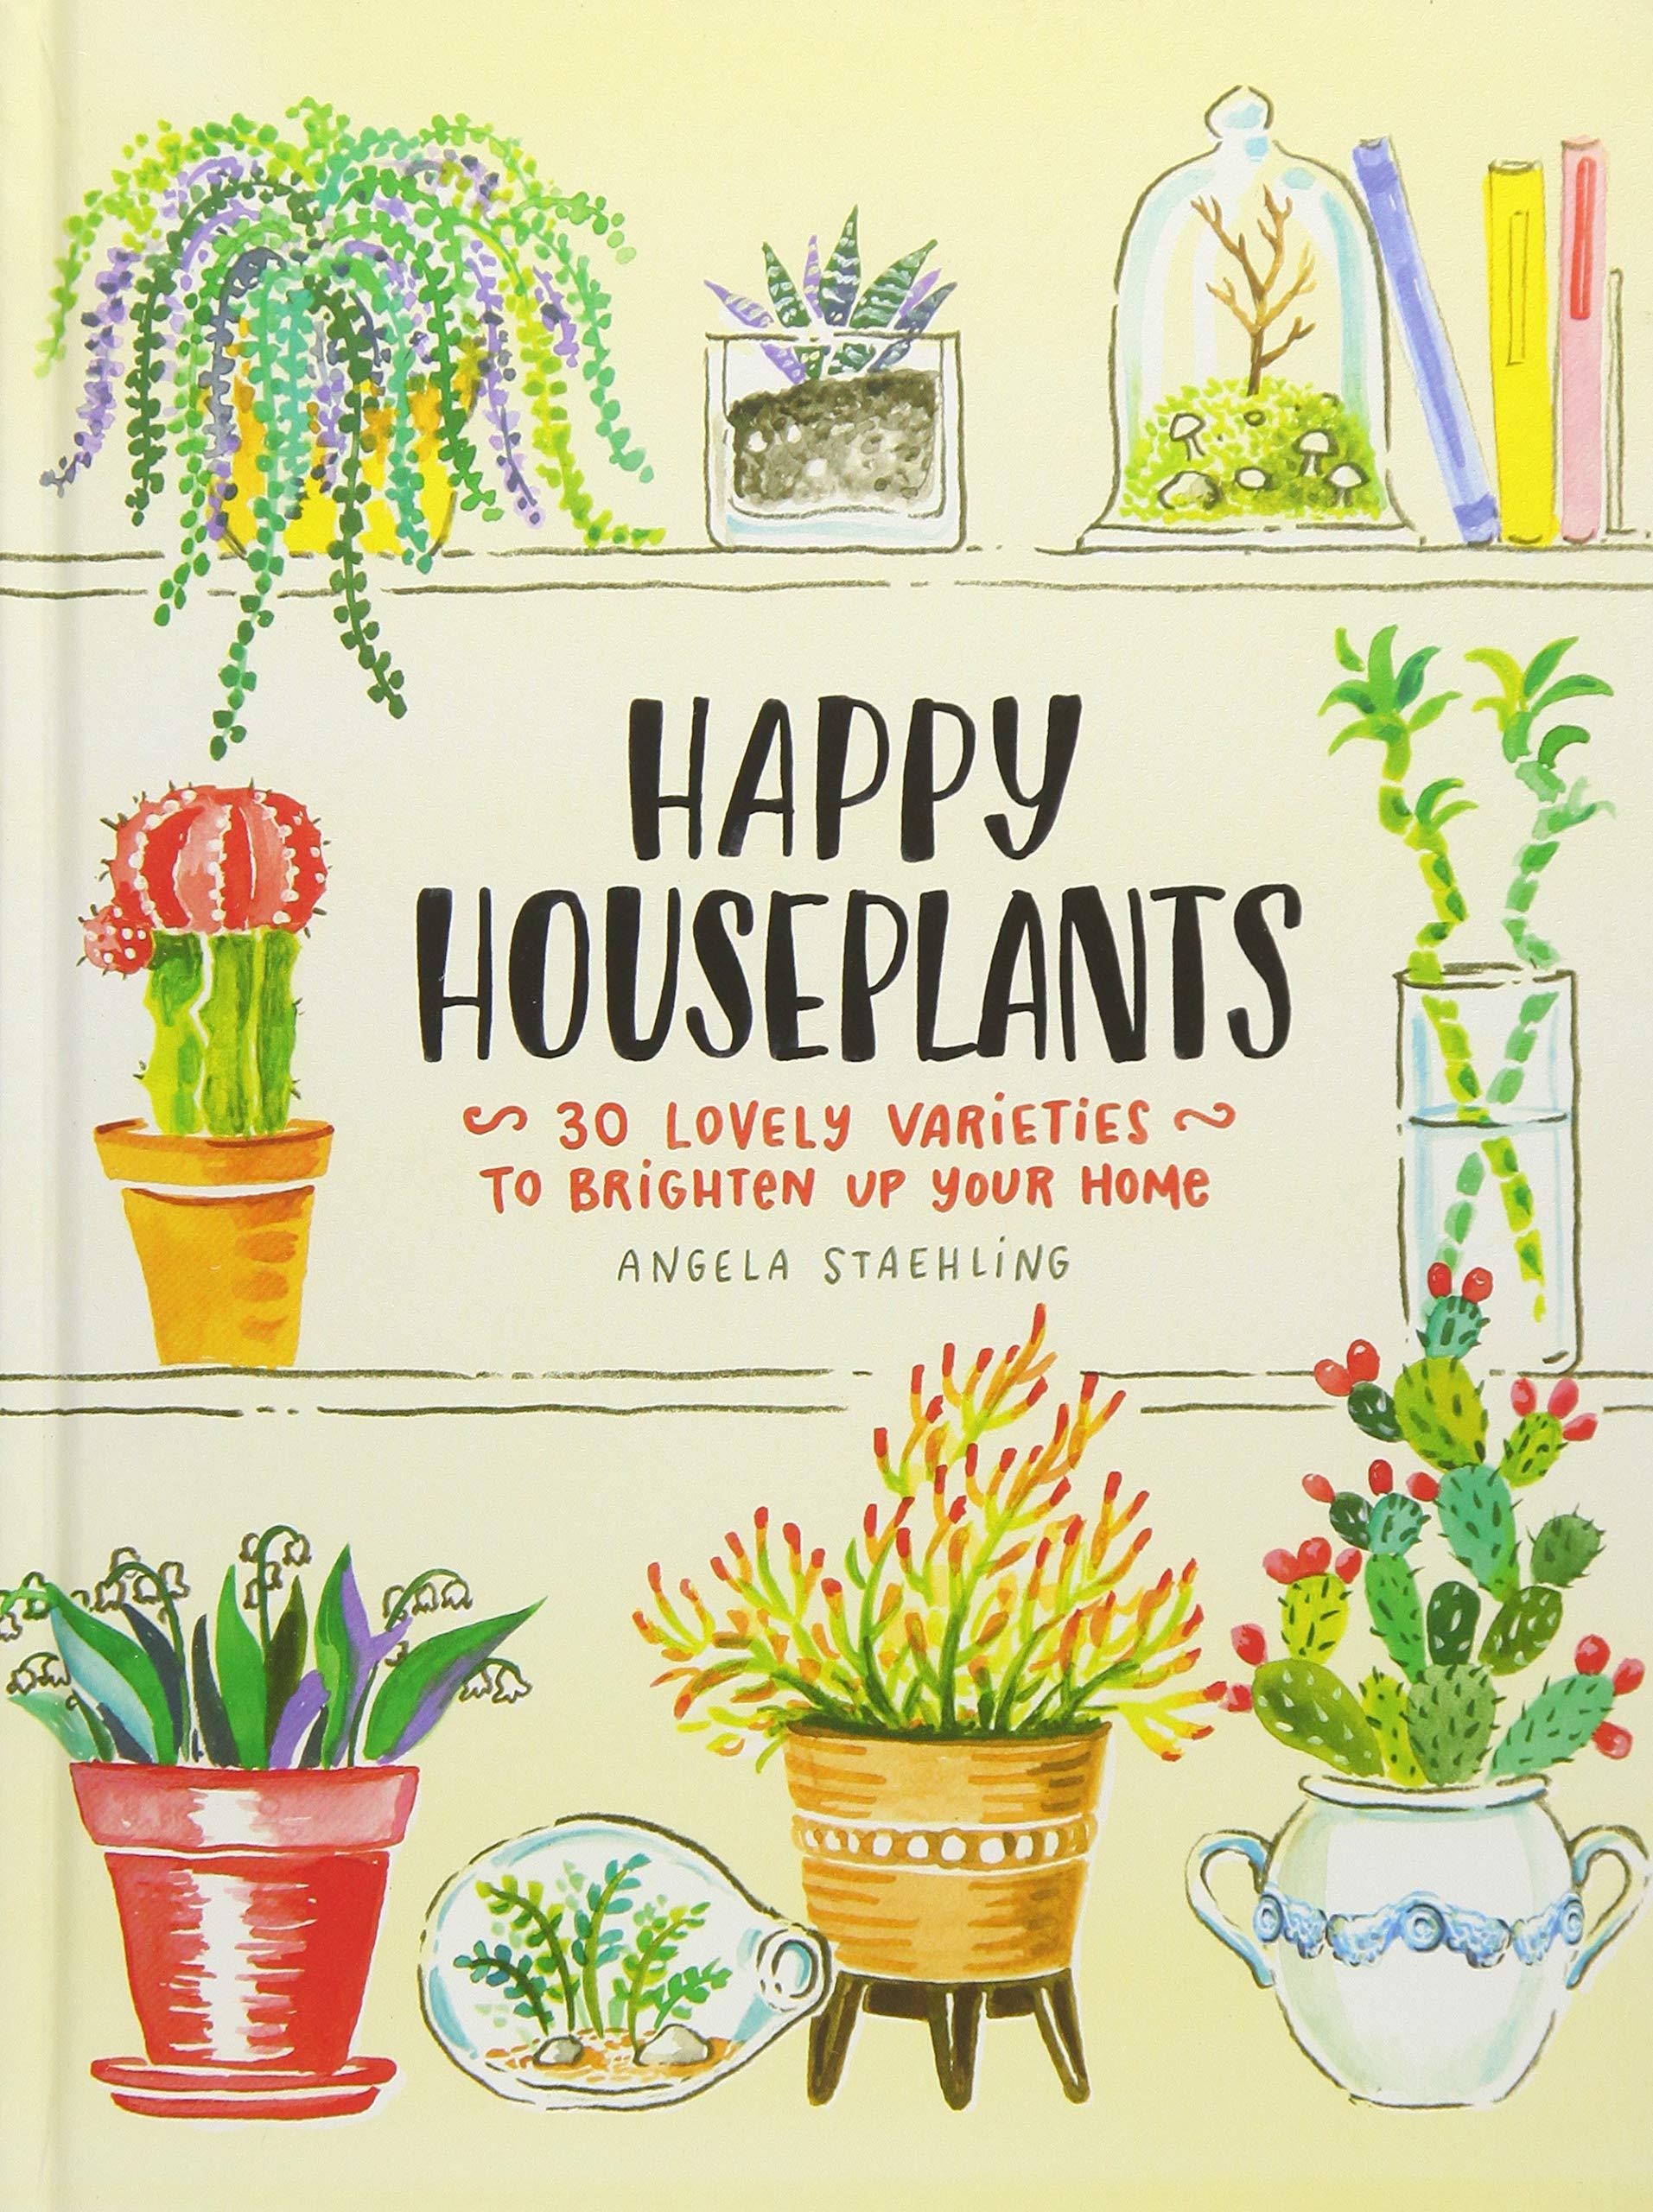 Happy Houseplants 30 Lovely Varieties To Brighten Up Your Home